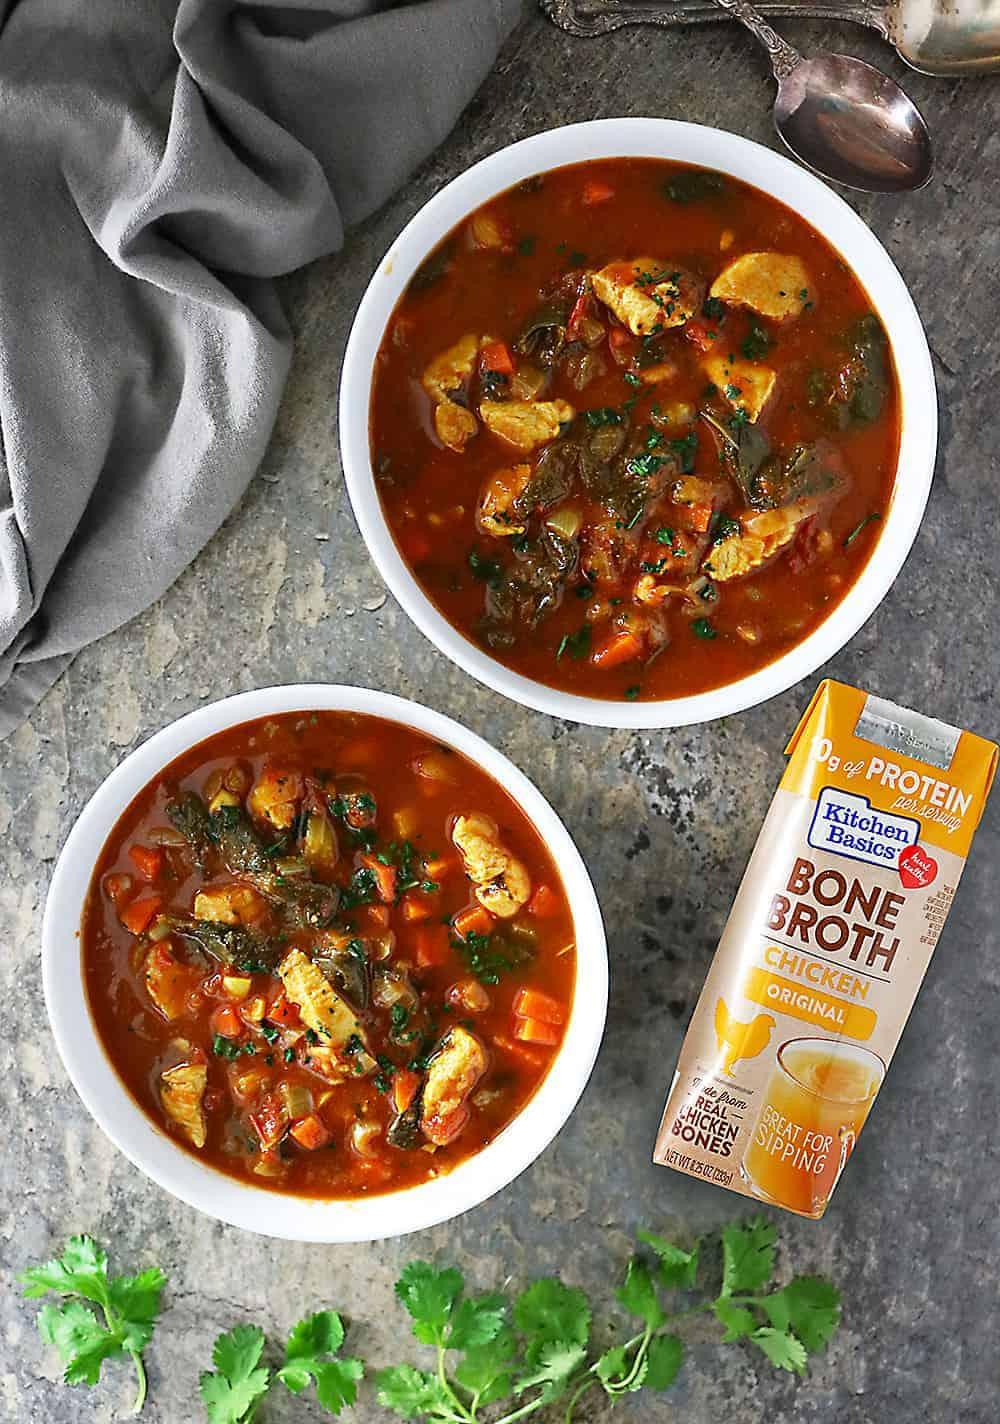 Kitchen Basics Bone Broth In Easy Turkey Spinach Soup Photo